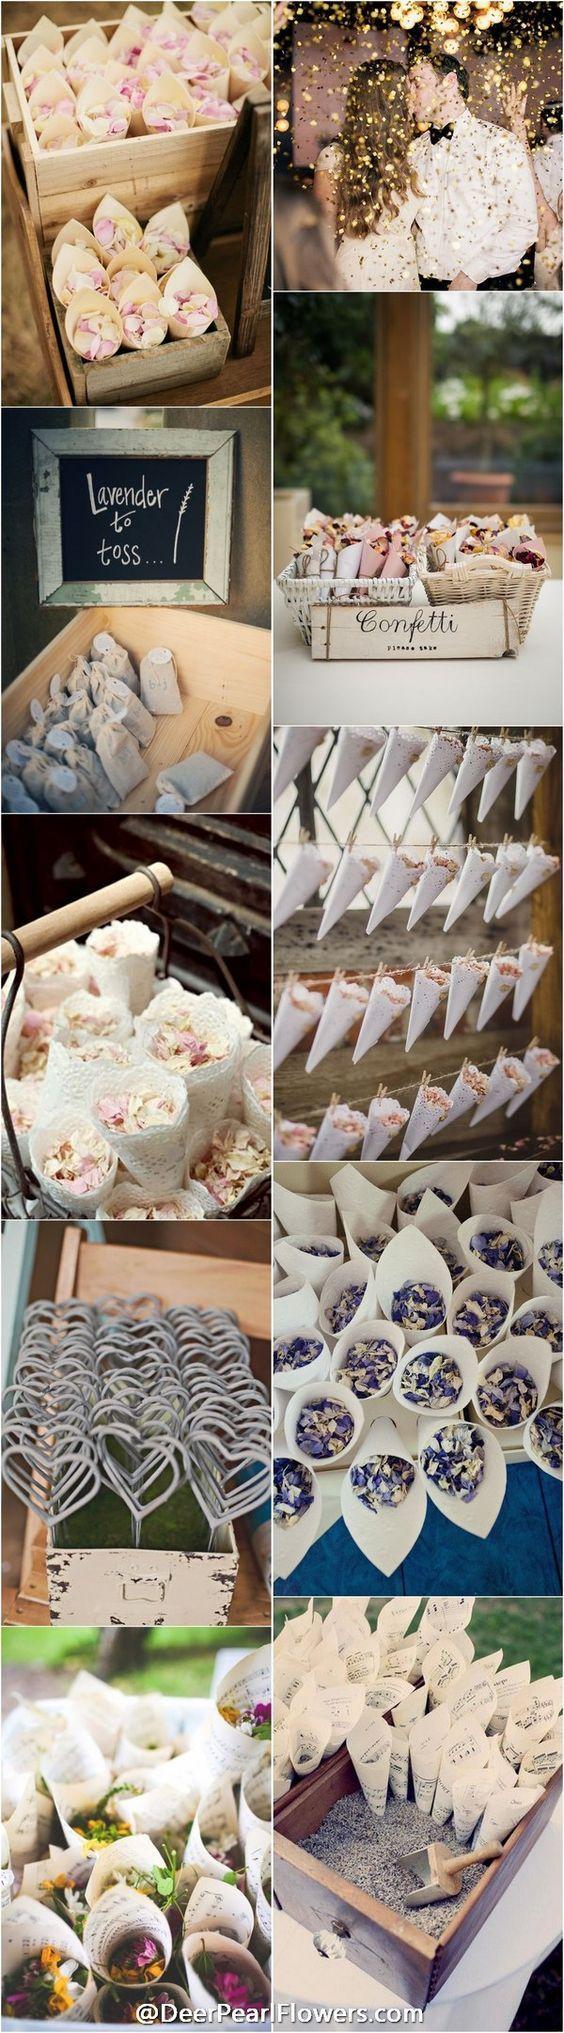 unique wedding ideas - wedding exit confetti moss send off ideas /  http://www.deerpearlflowers.com/wedding-exit-send-off-ideas/